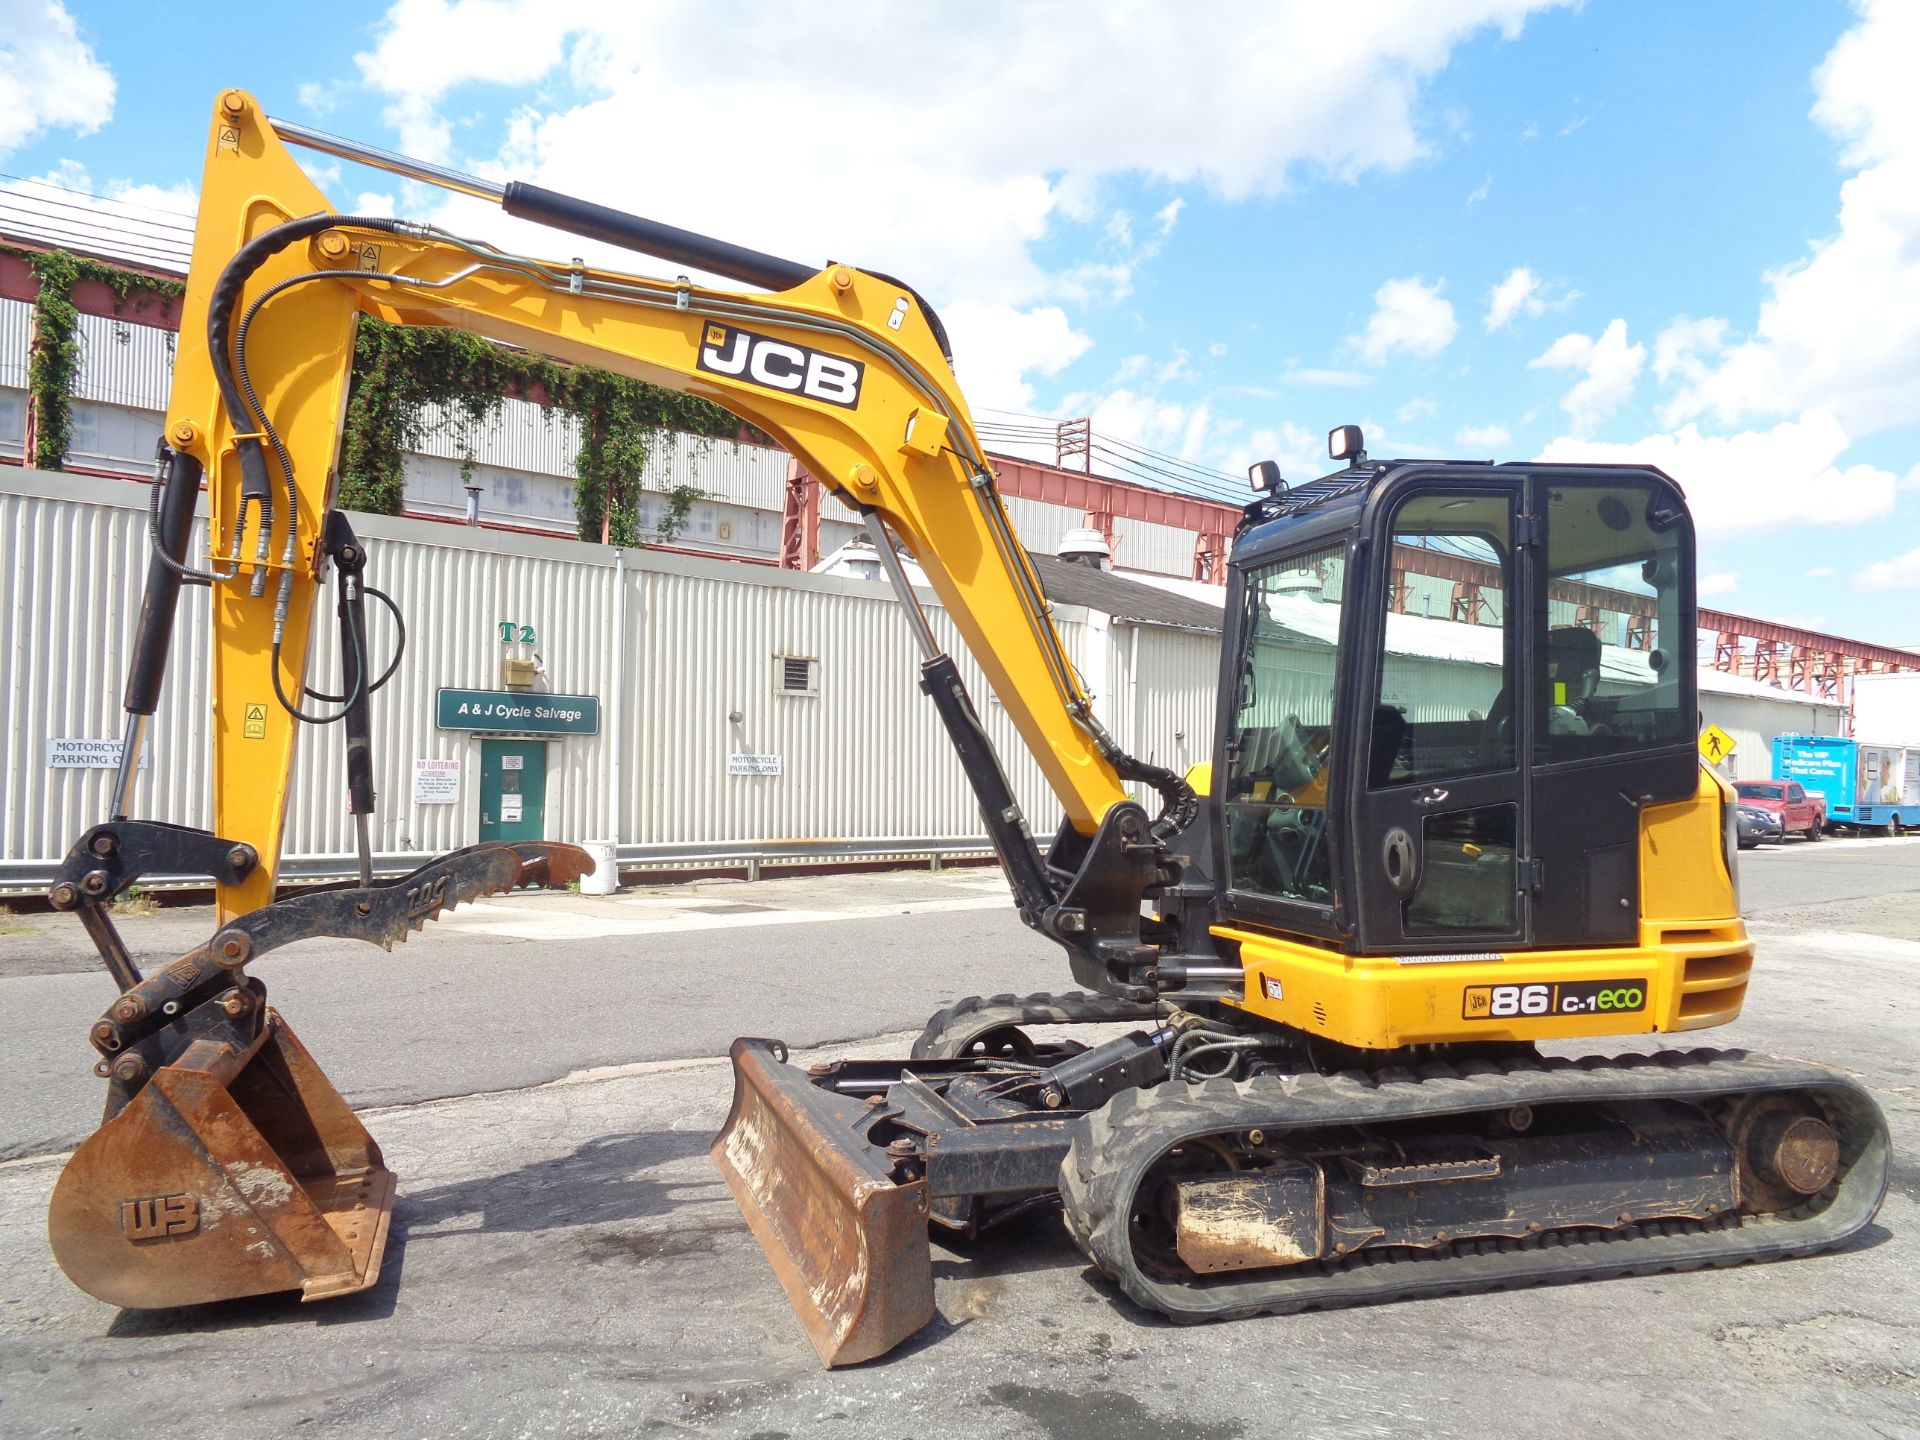 Lot 35 - 2016 JCB 86C-1 Midi Excavator Only 605 hours